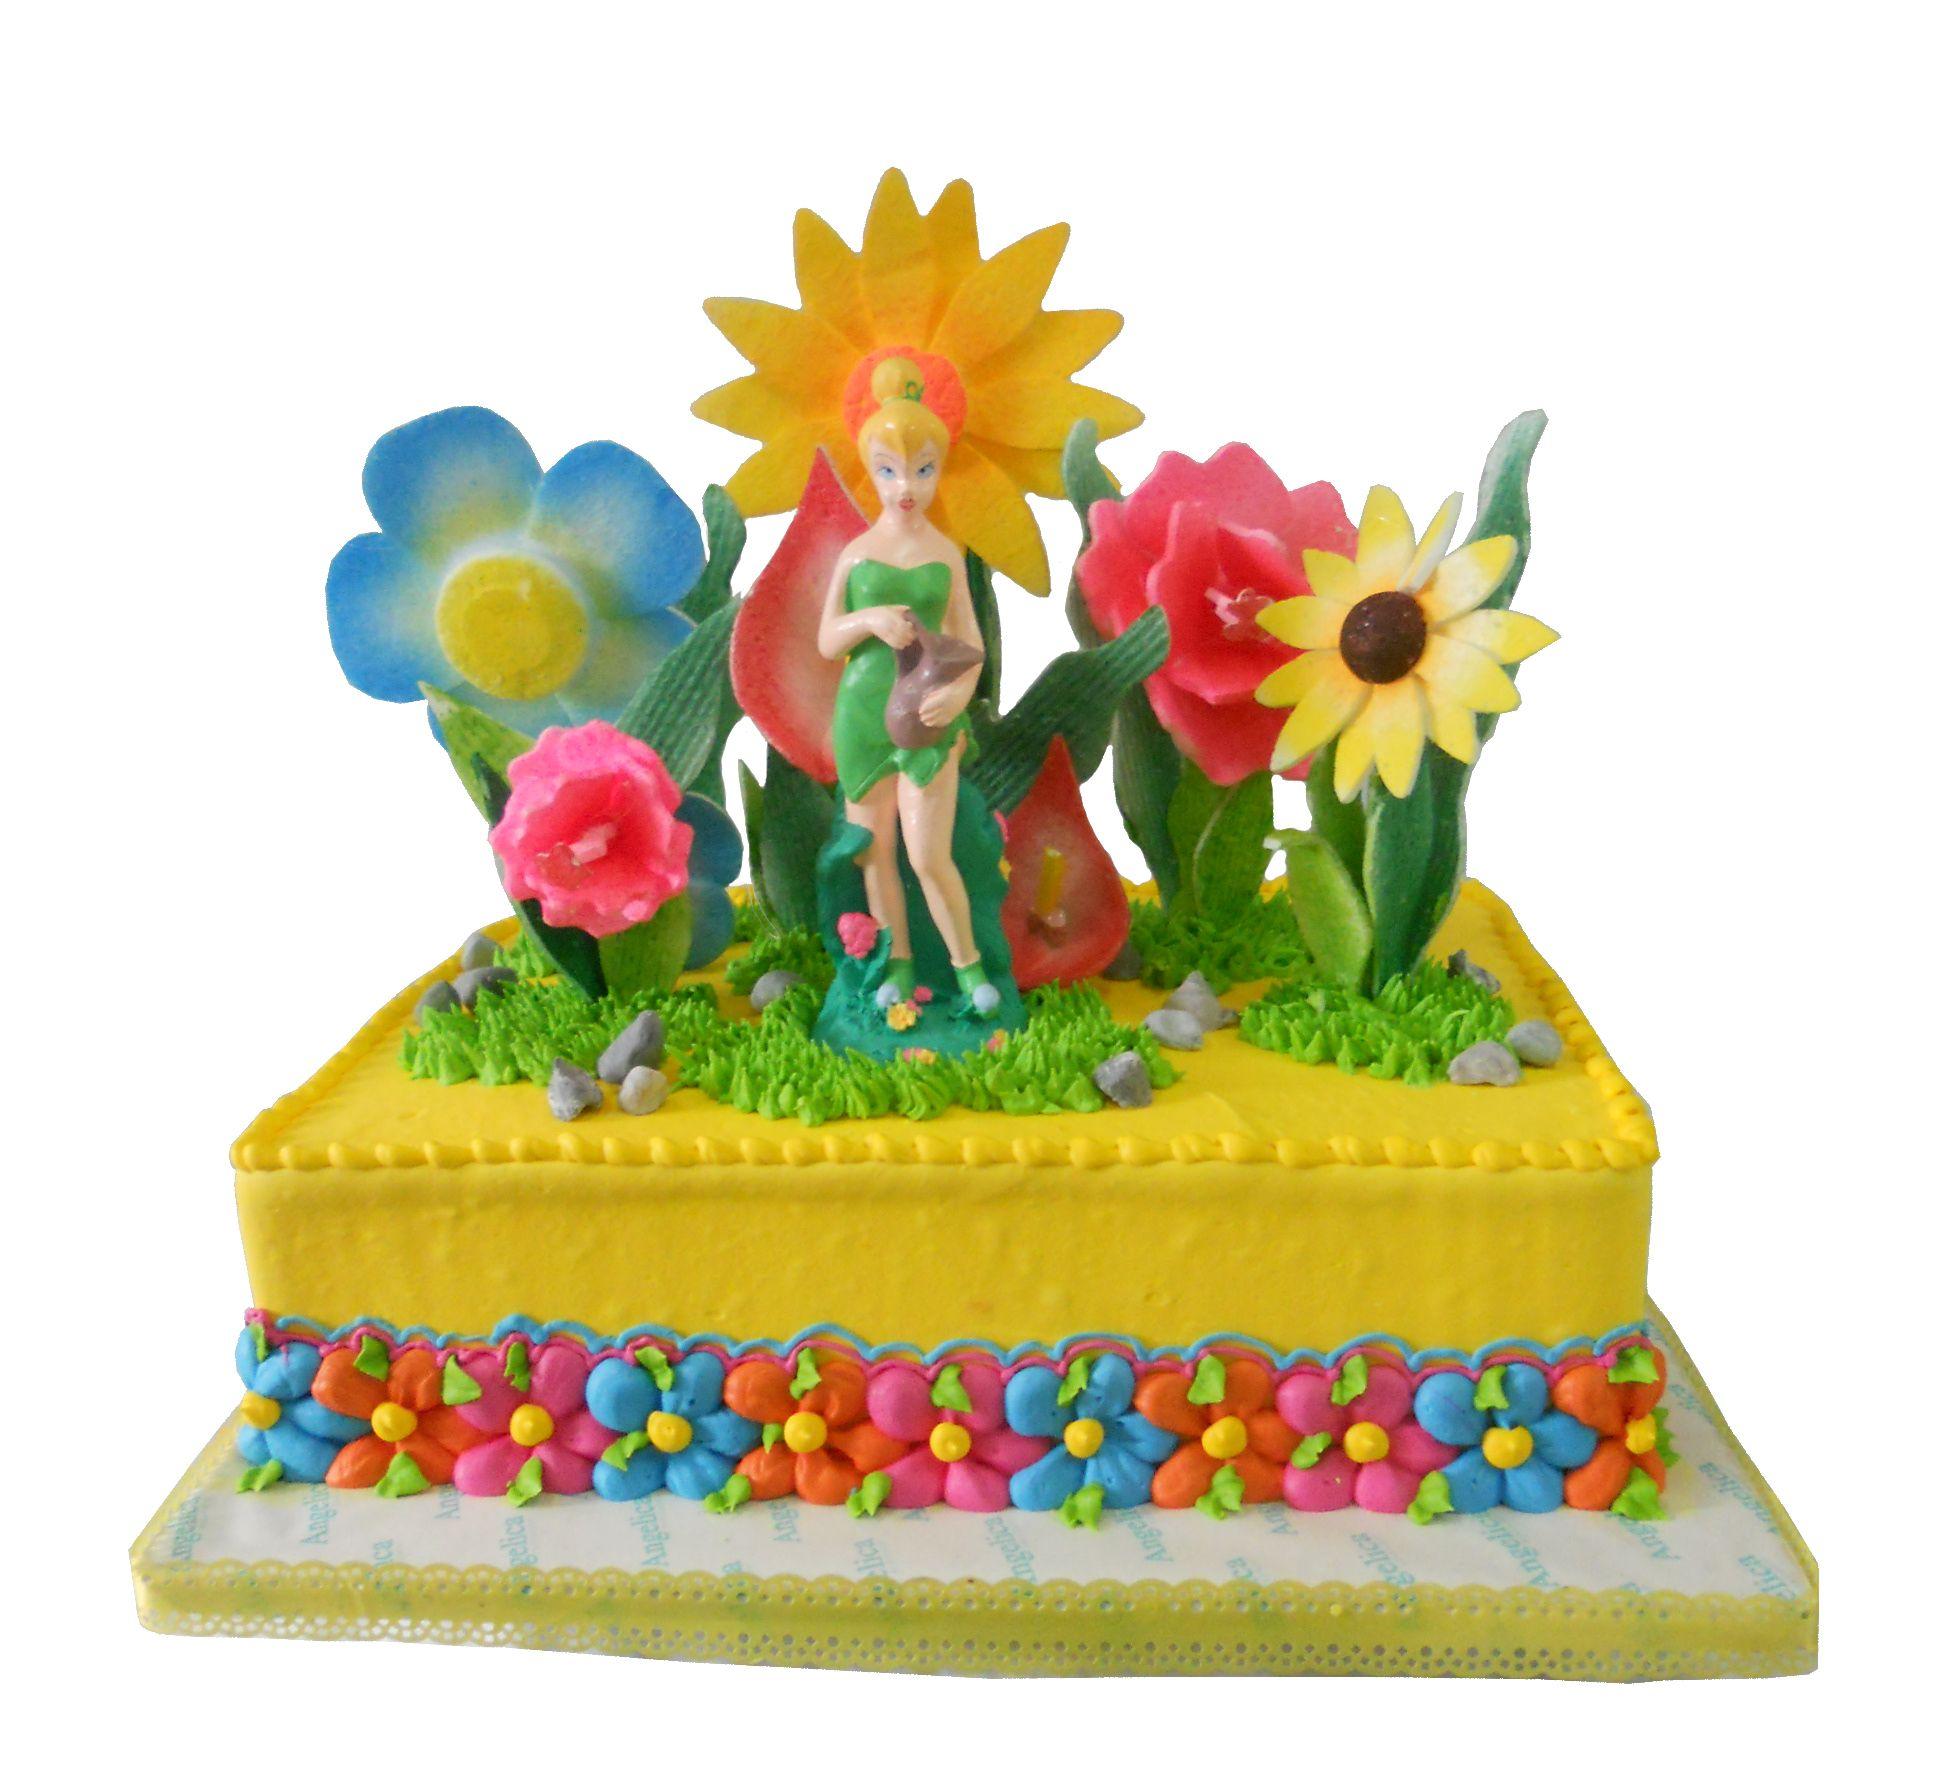 Tinkerbell 39 s yellow garden angelica bakeshop cebu kids for Angelica cake decoration